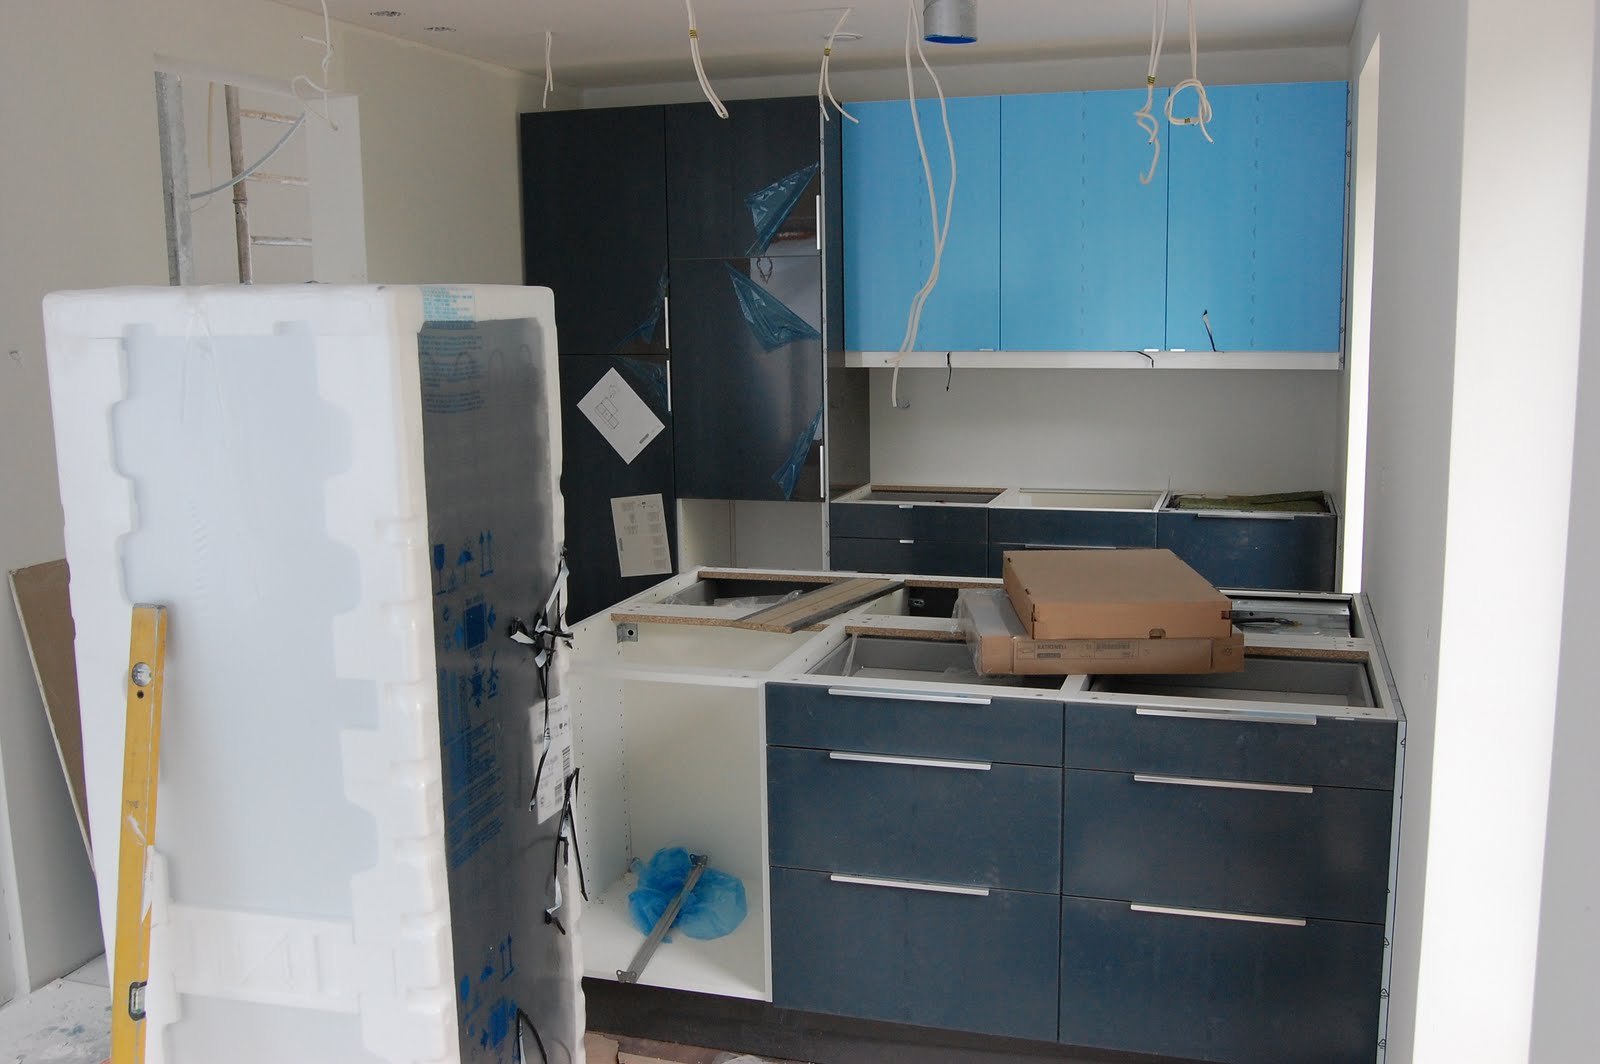 Projekteista isoin We have a kitchen!